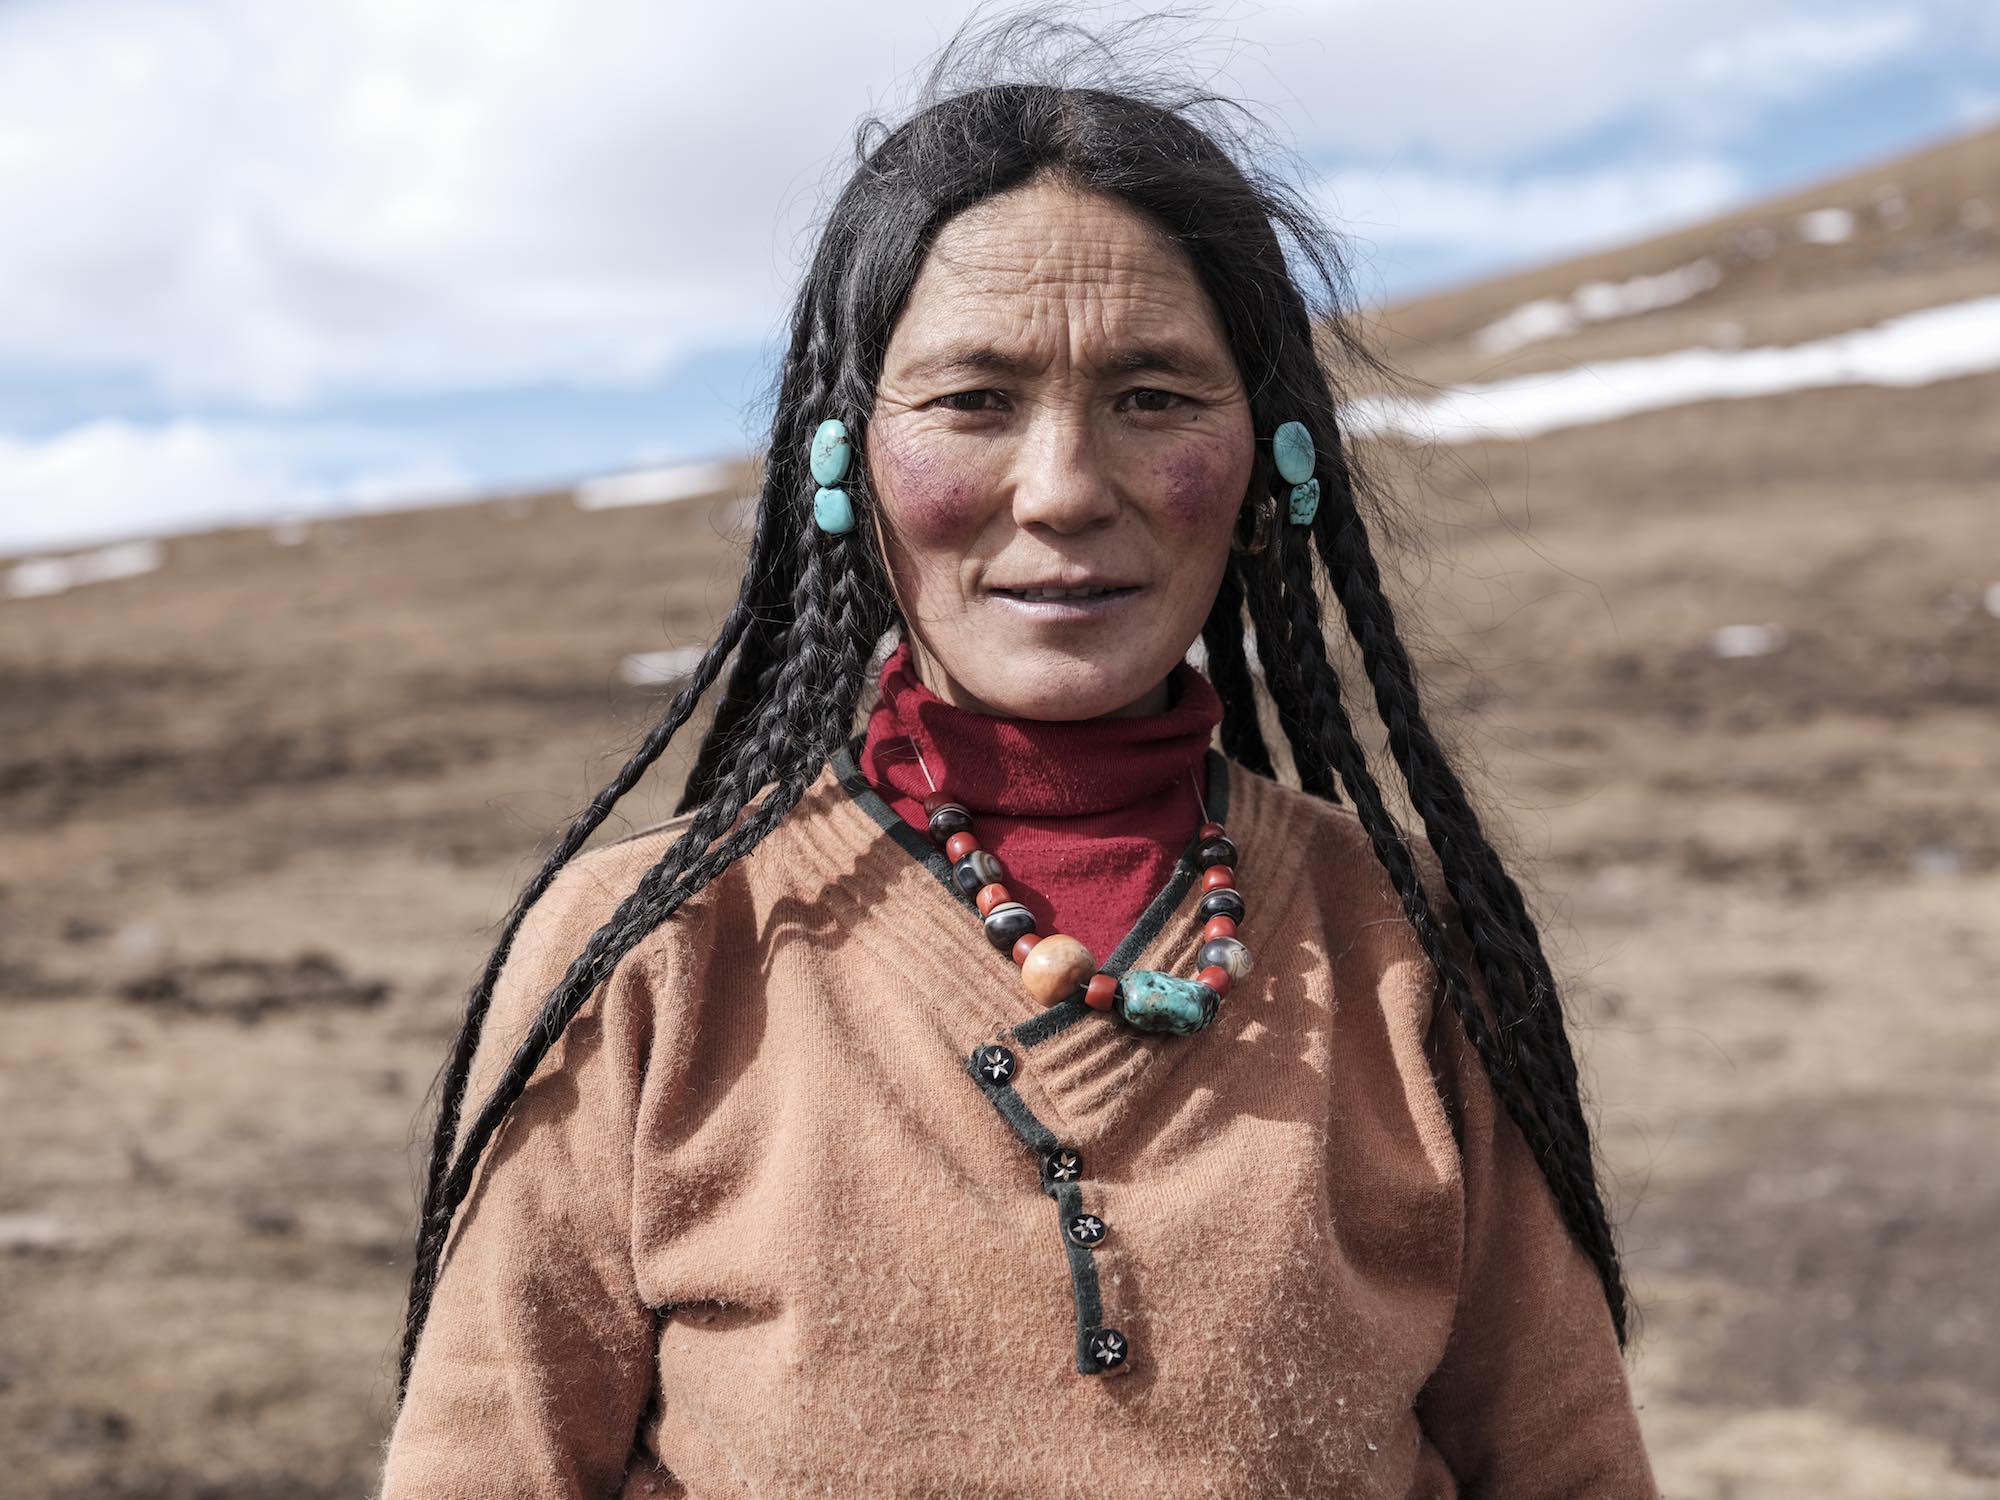 tibet lady chengdu Commercial Editorial Portraiture Documentary Photographer fujifilm Director Singapore Jose Jeuland photography fashion street mountain